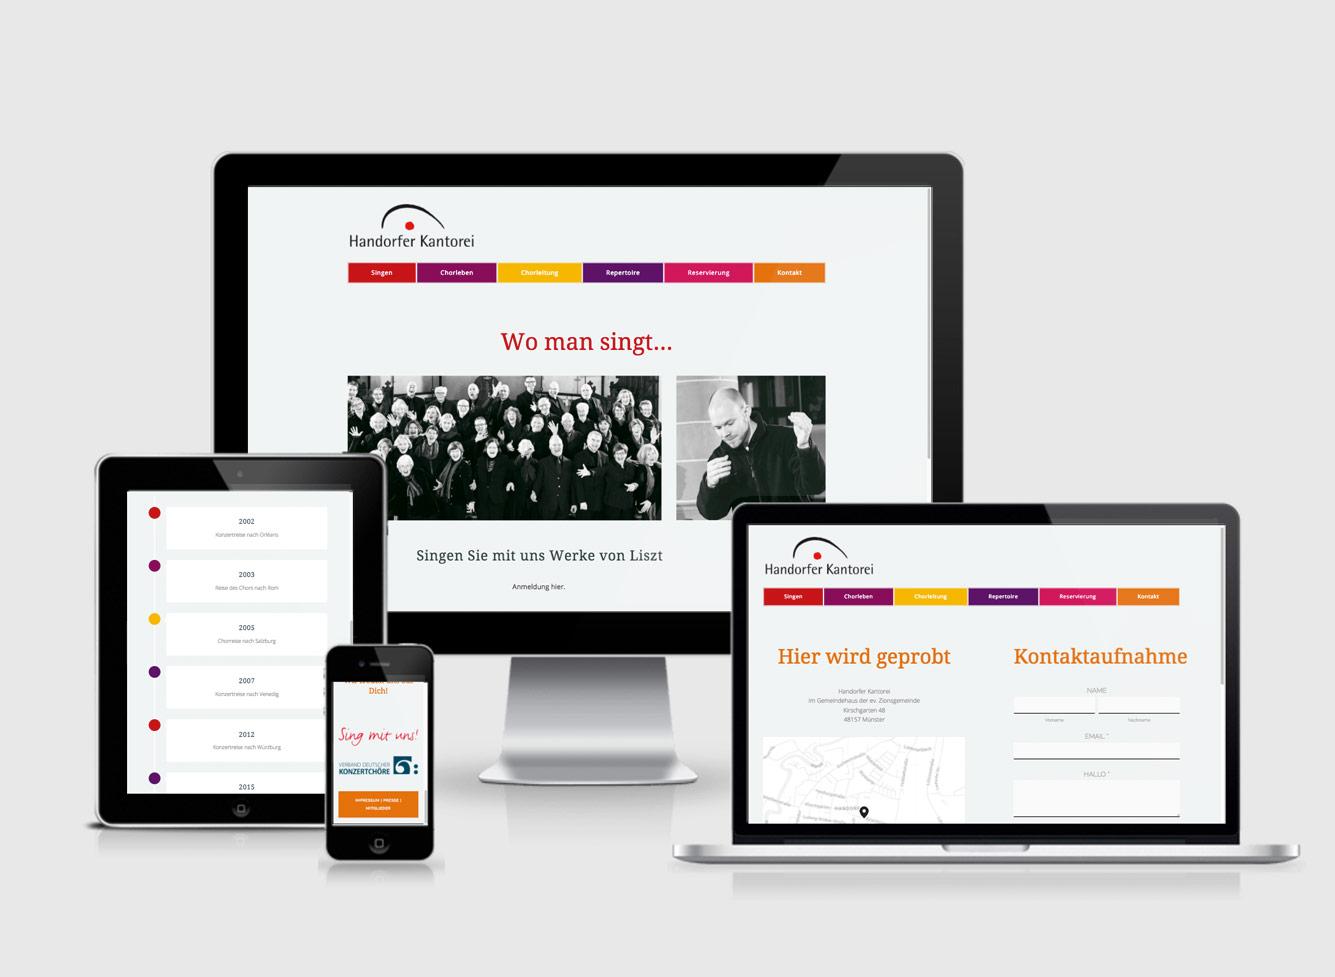 handorfer-kantorei-website-termine-sssupers.jpg